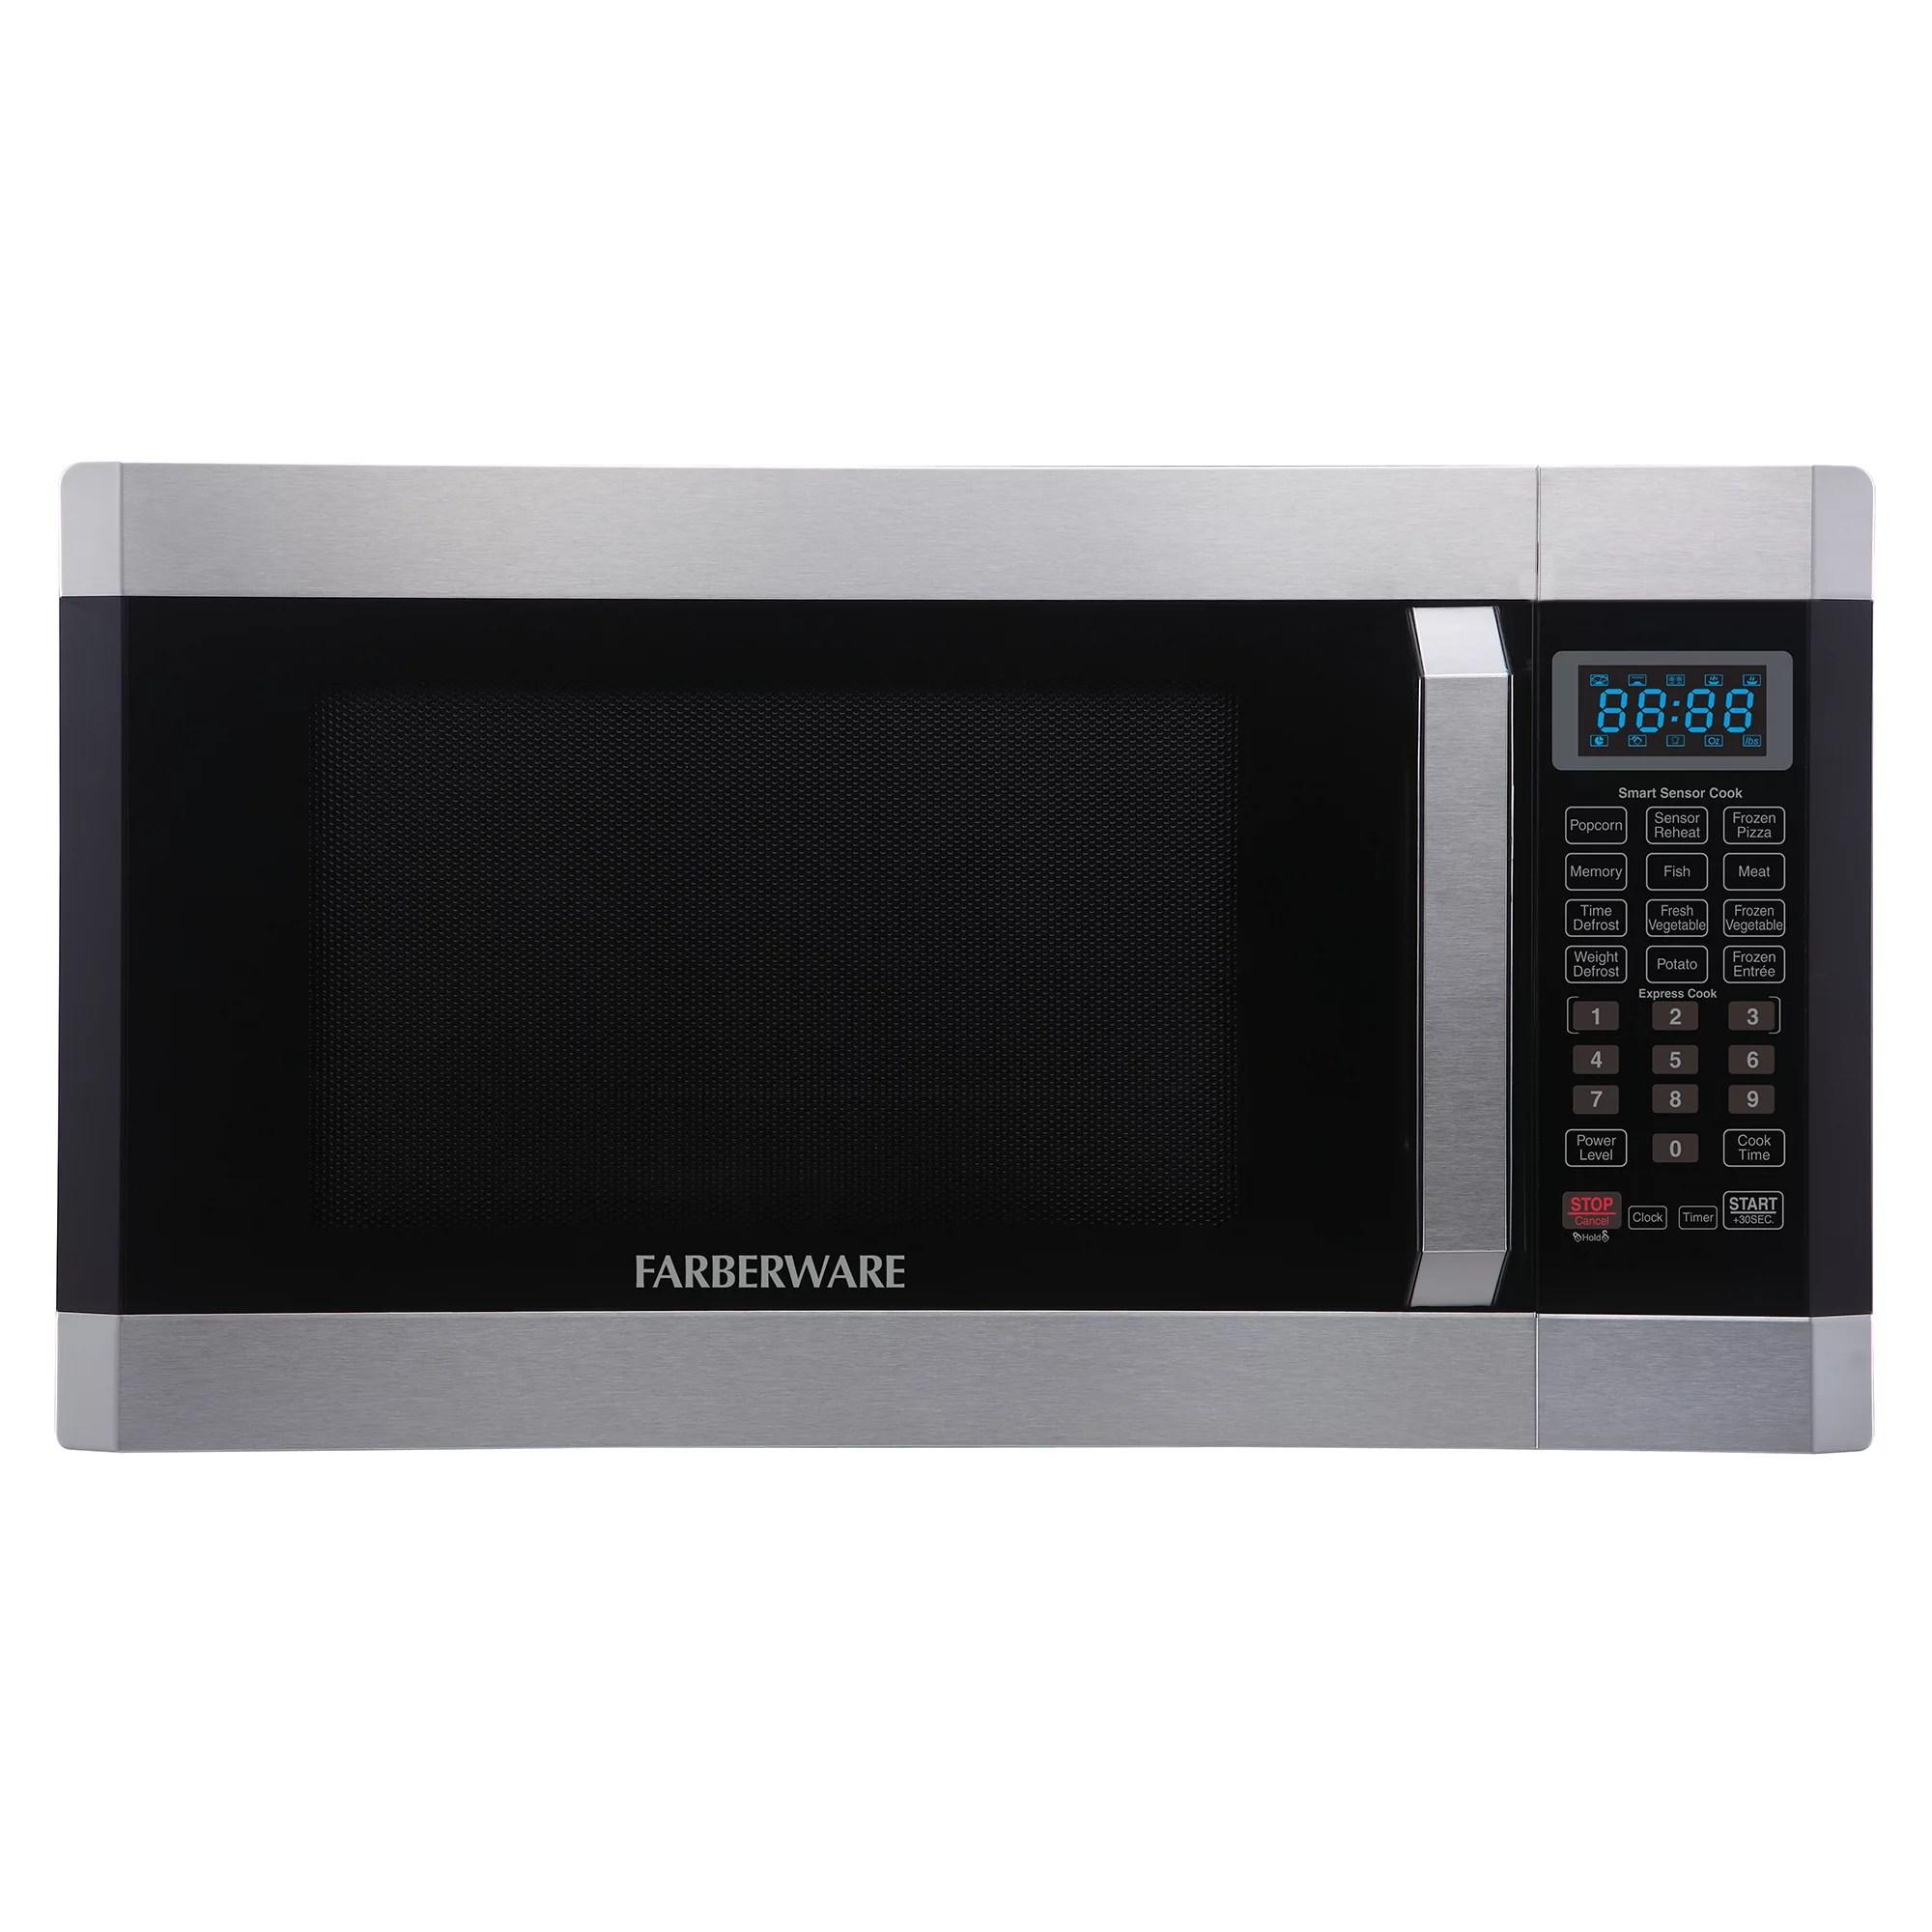 farberware 1 6 cu ft 1100 watt microwave oven with smart sensor stainless steel platinum